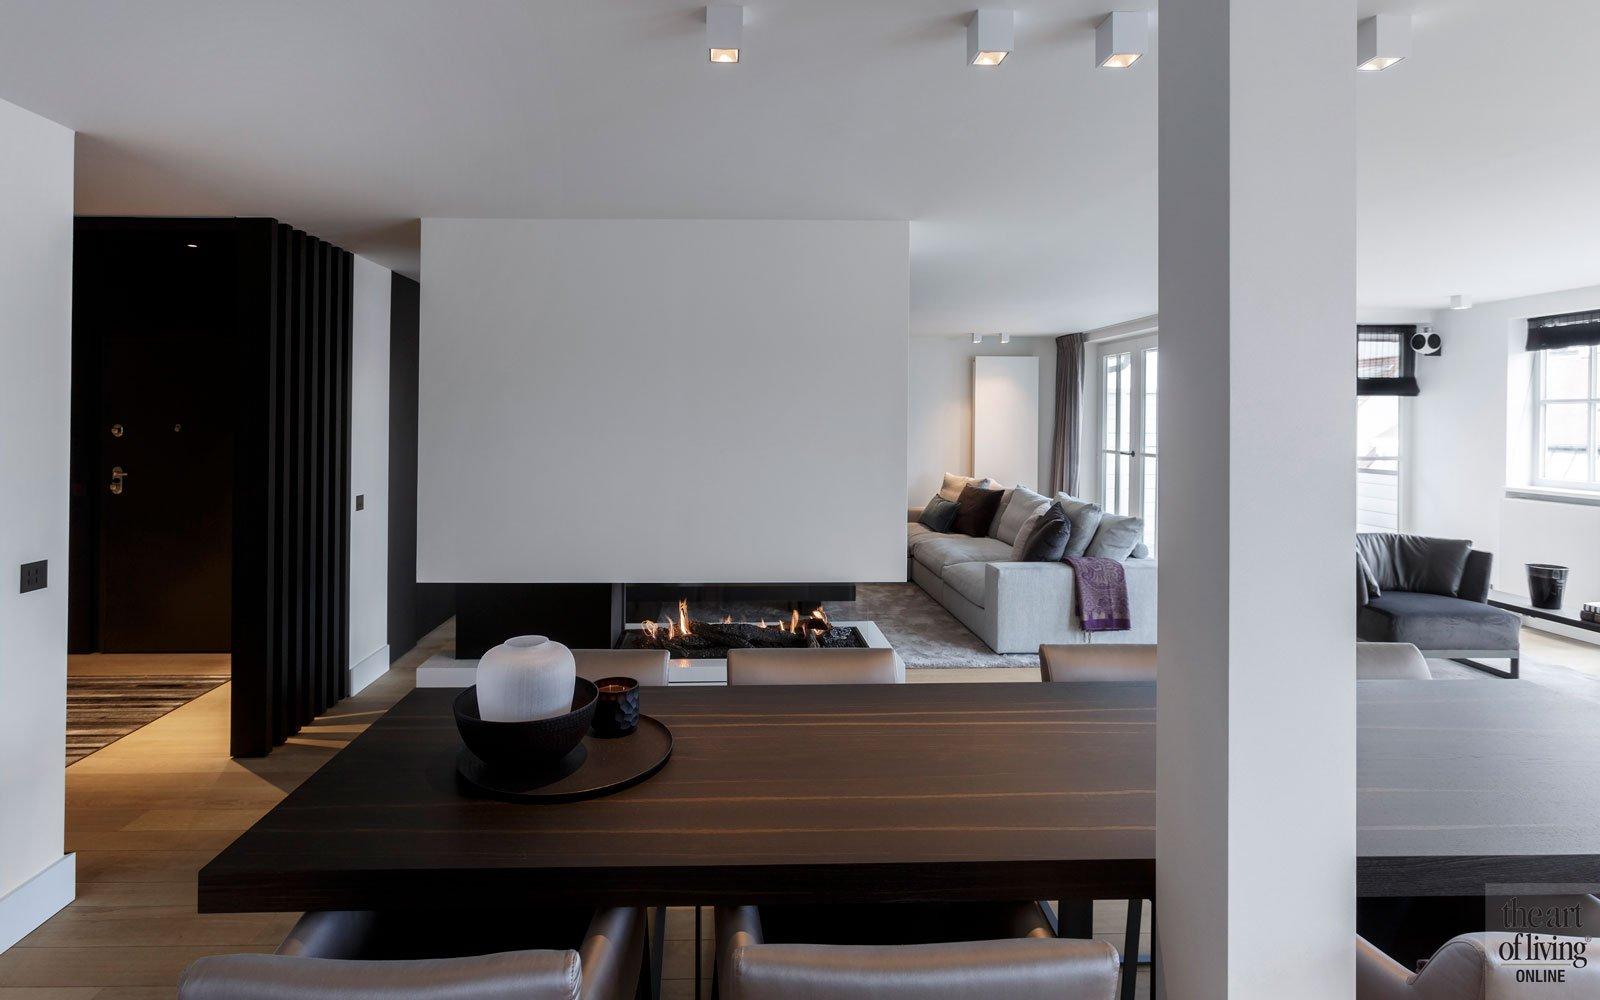 Woonkamer, keuken, verbinding, open haard, zwevende haard, modern appartement, DesignbyAnke